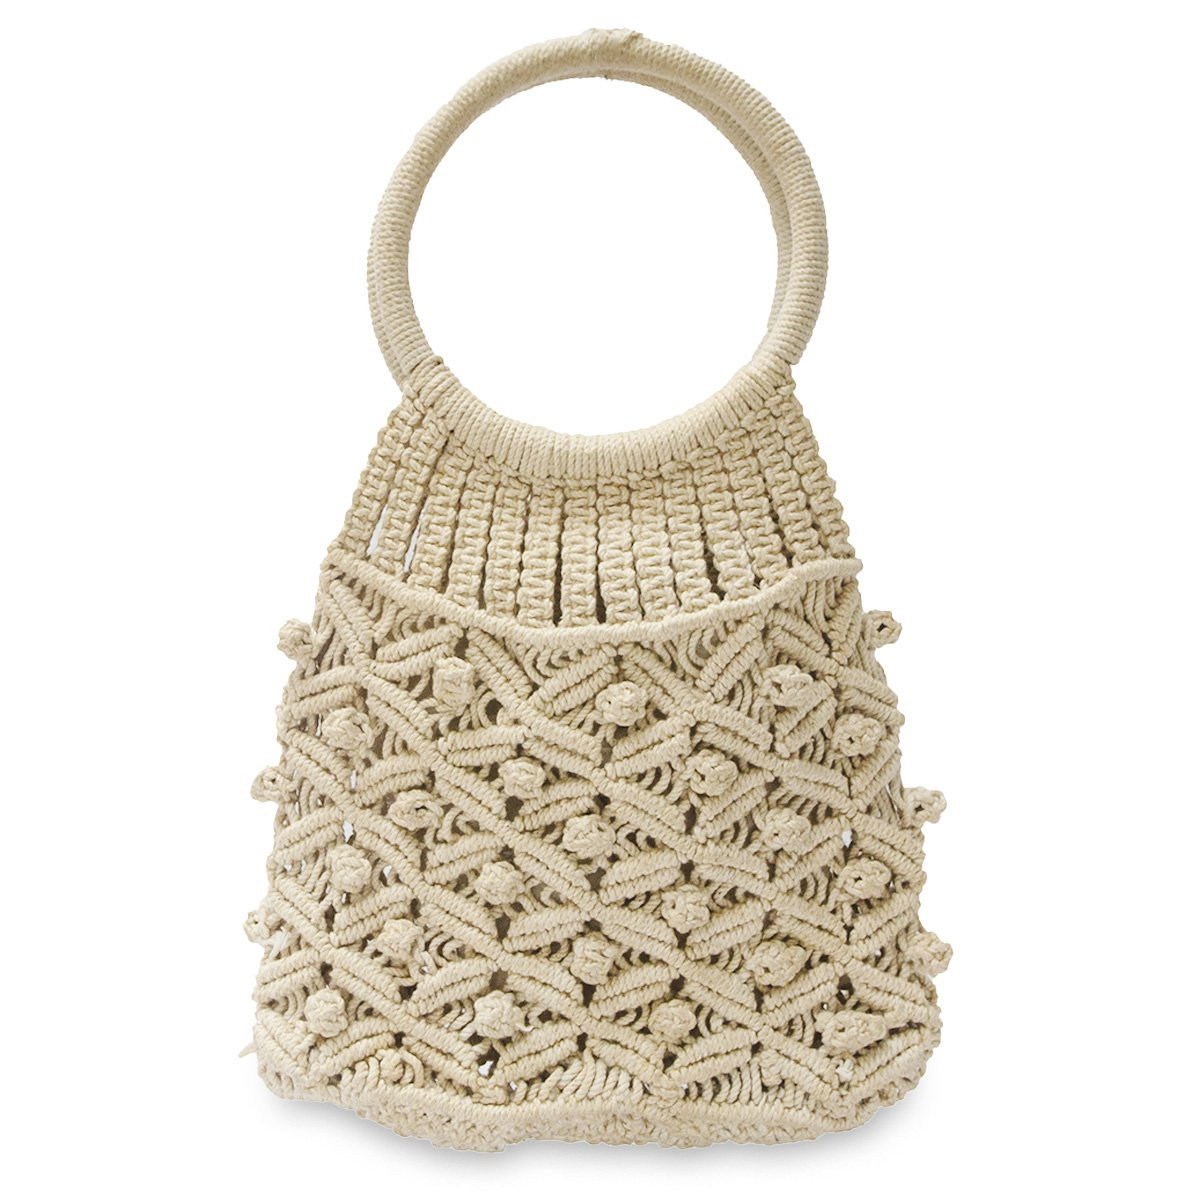 Vintage Macrame Handbag, Cream